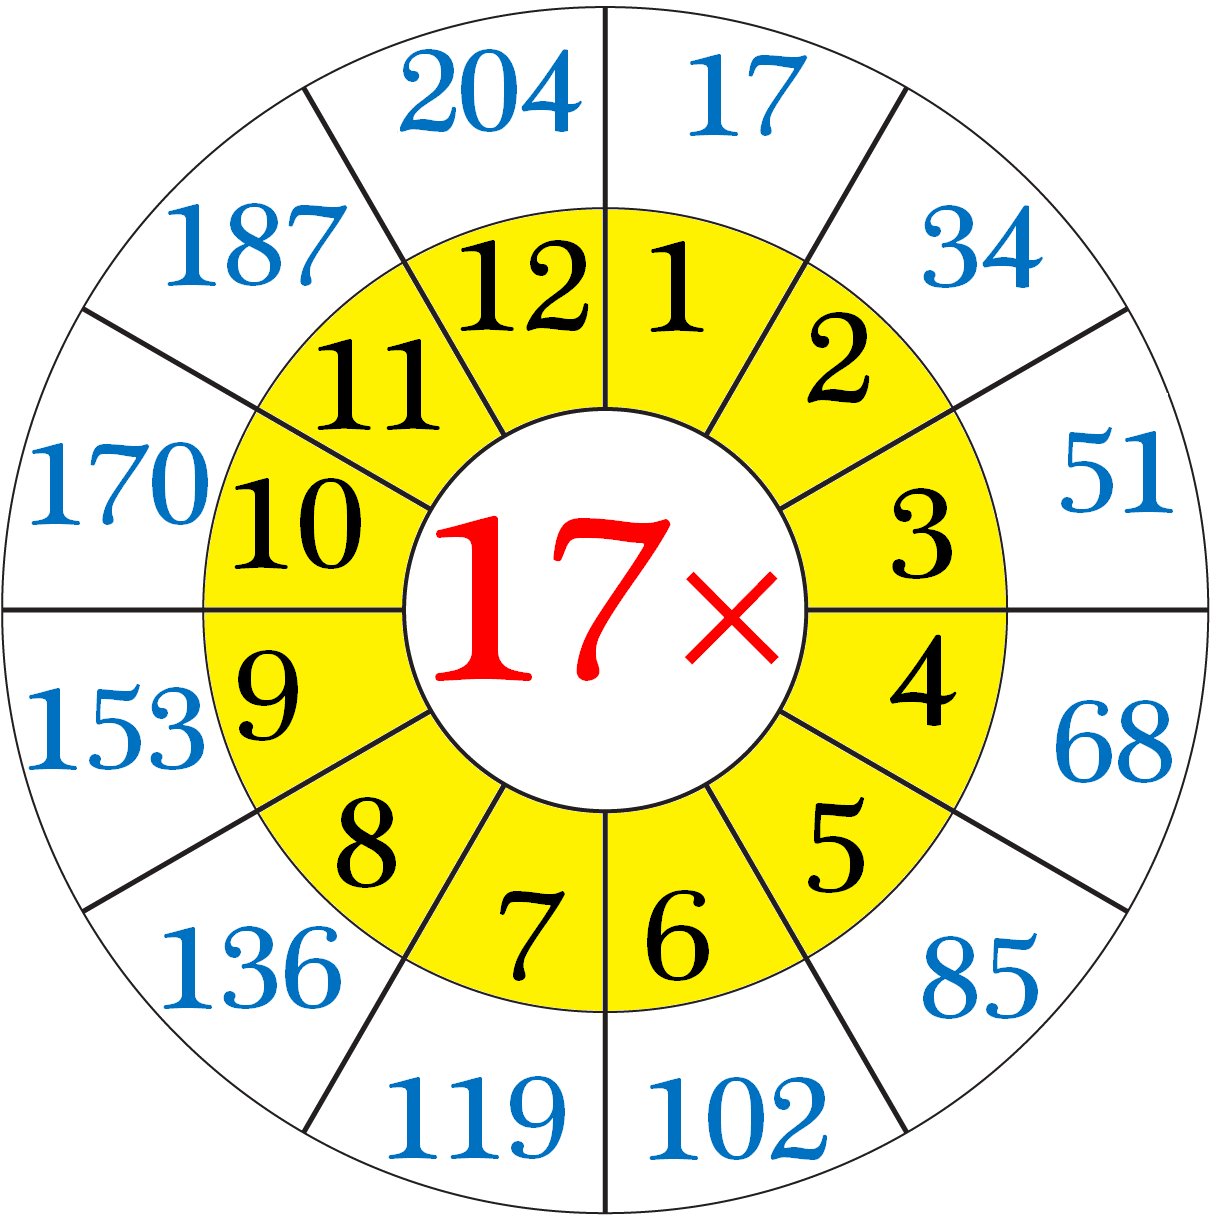 Worksheet On Multiplication Table Of 17